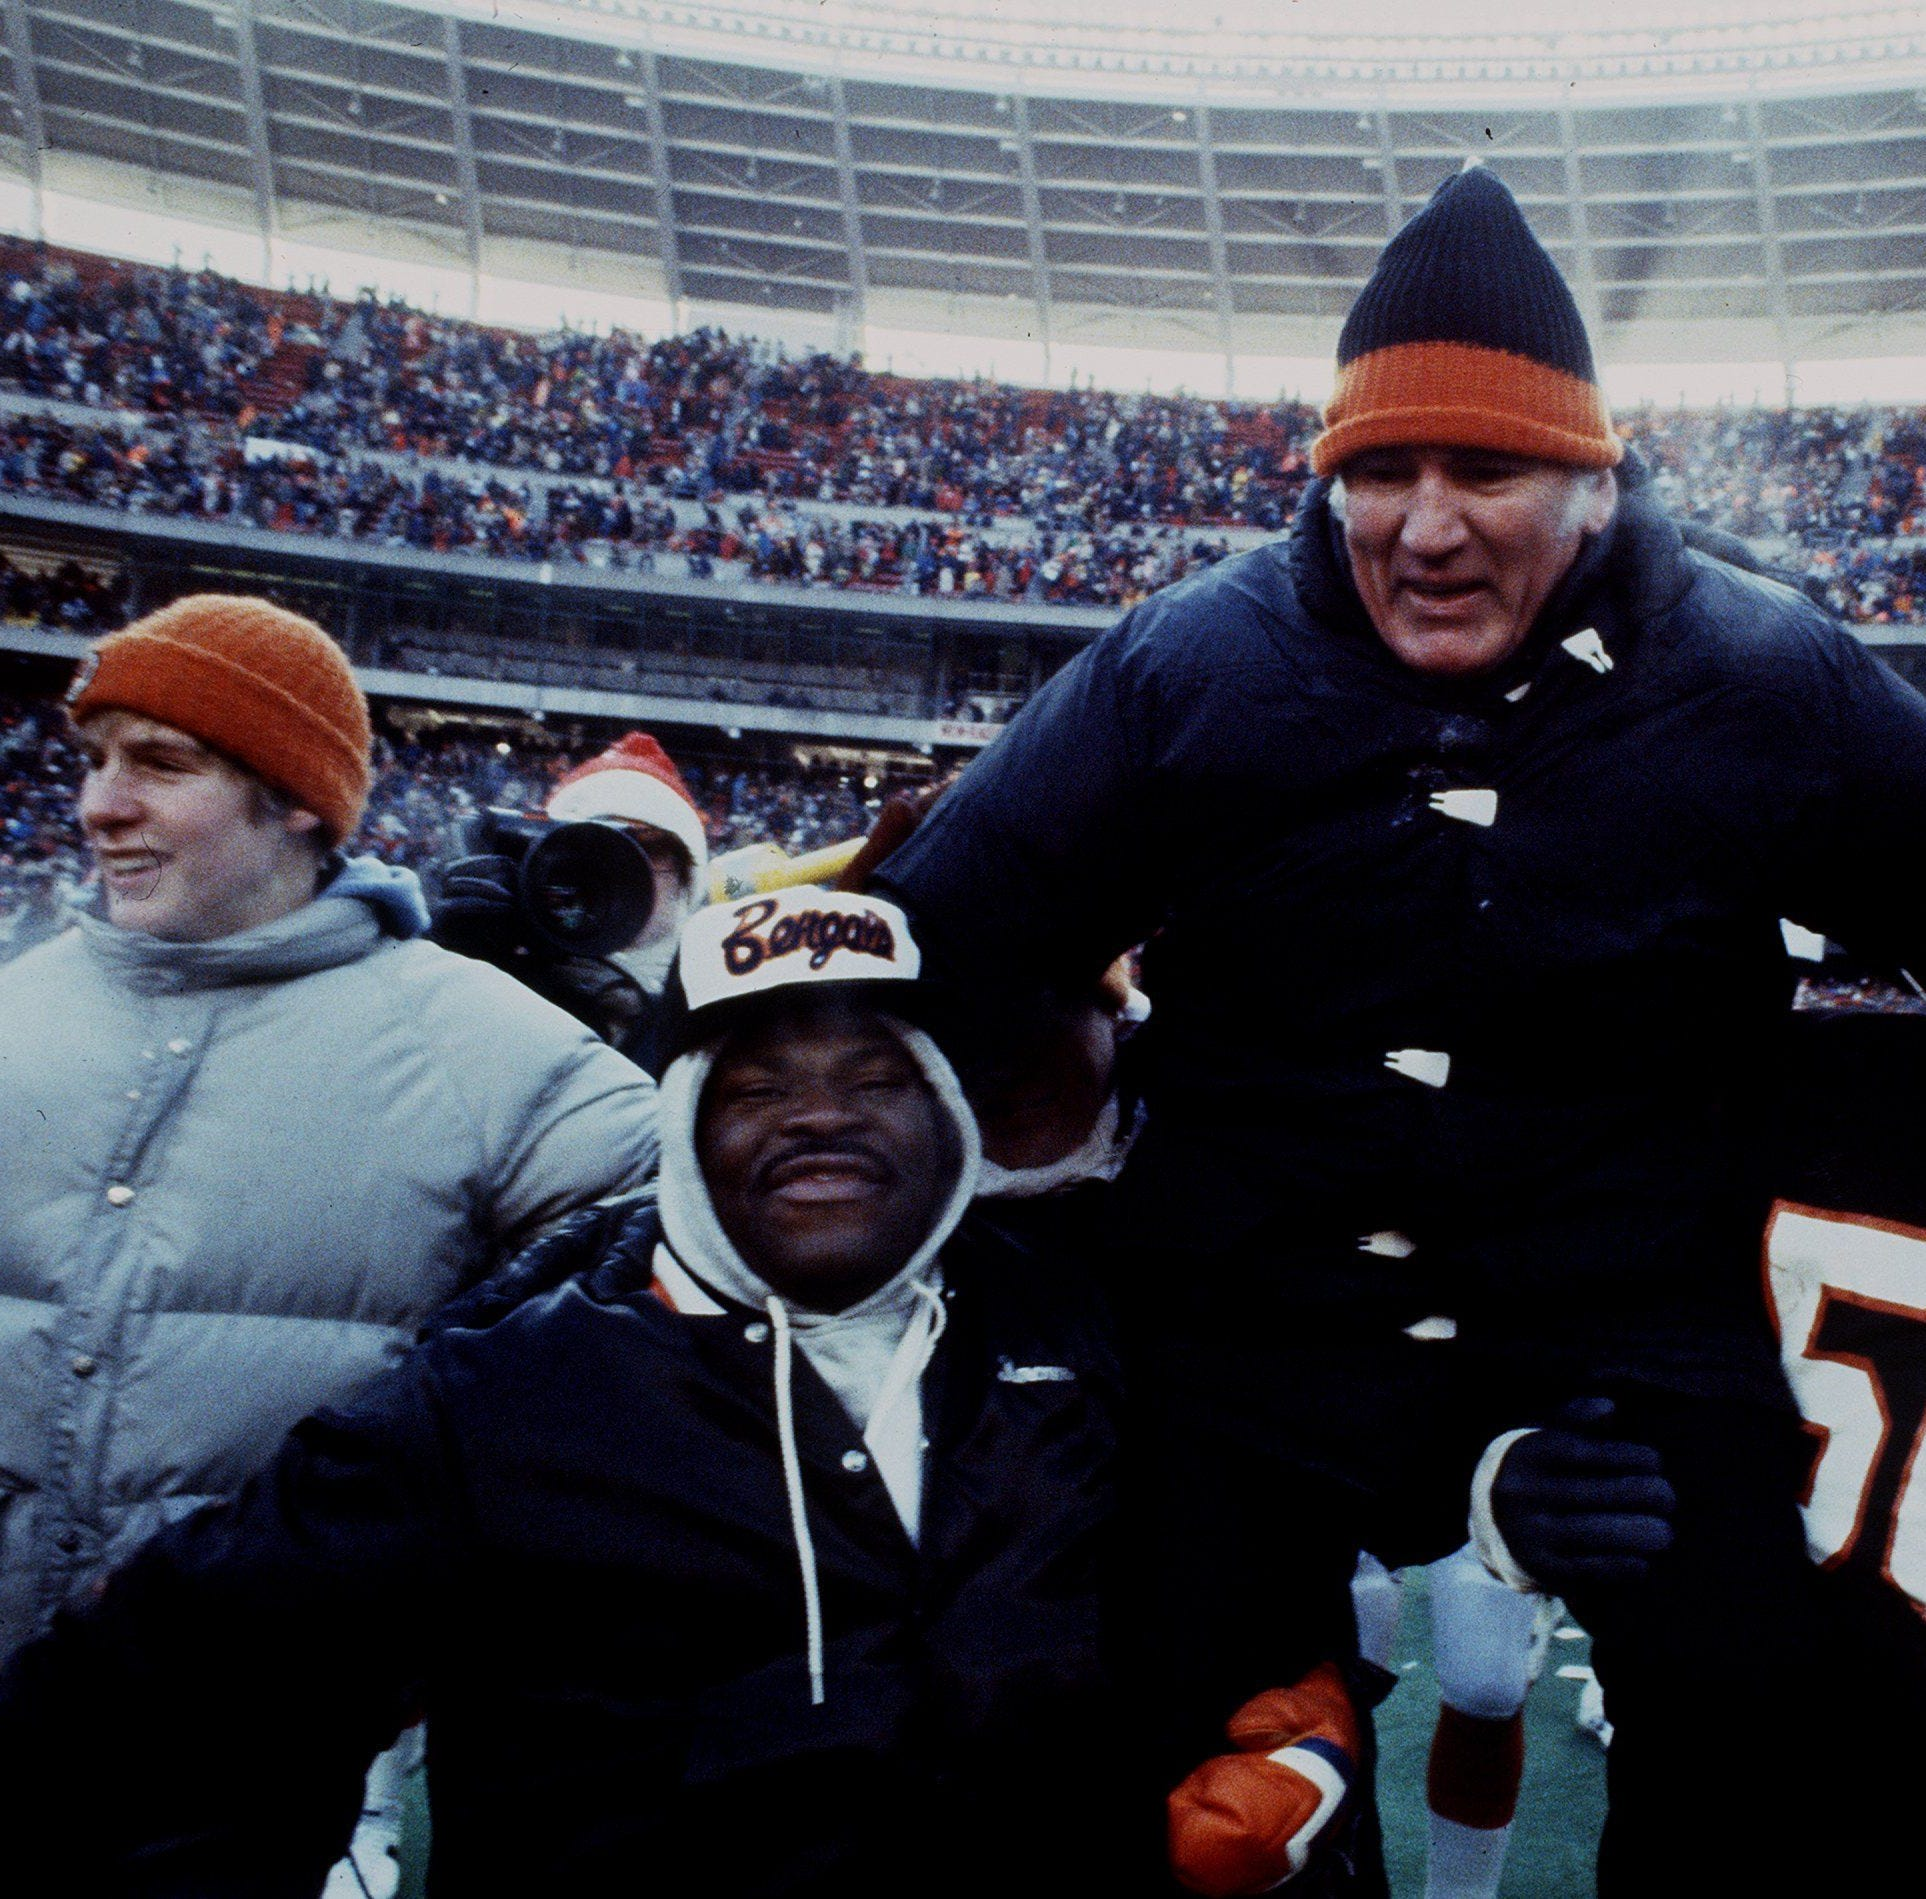 Cincinnati Bengals Super Bowl XVI coach Forrest Gregg dies